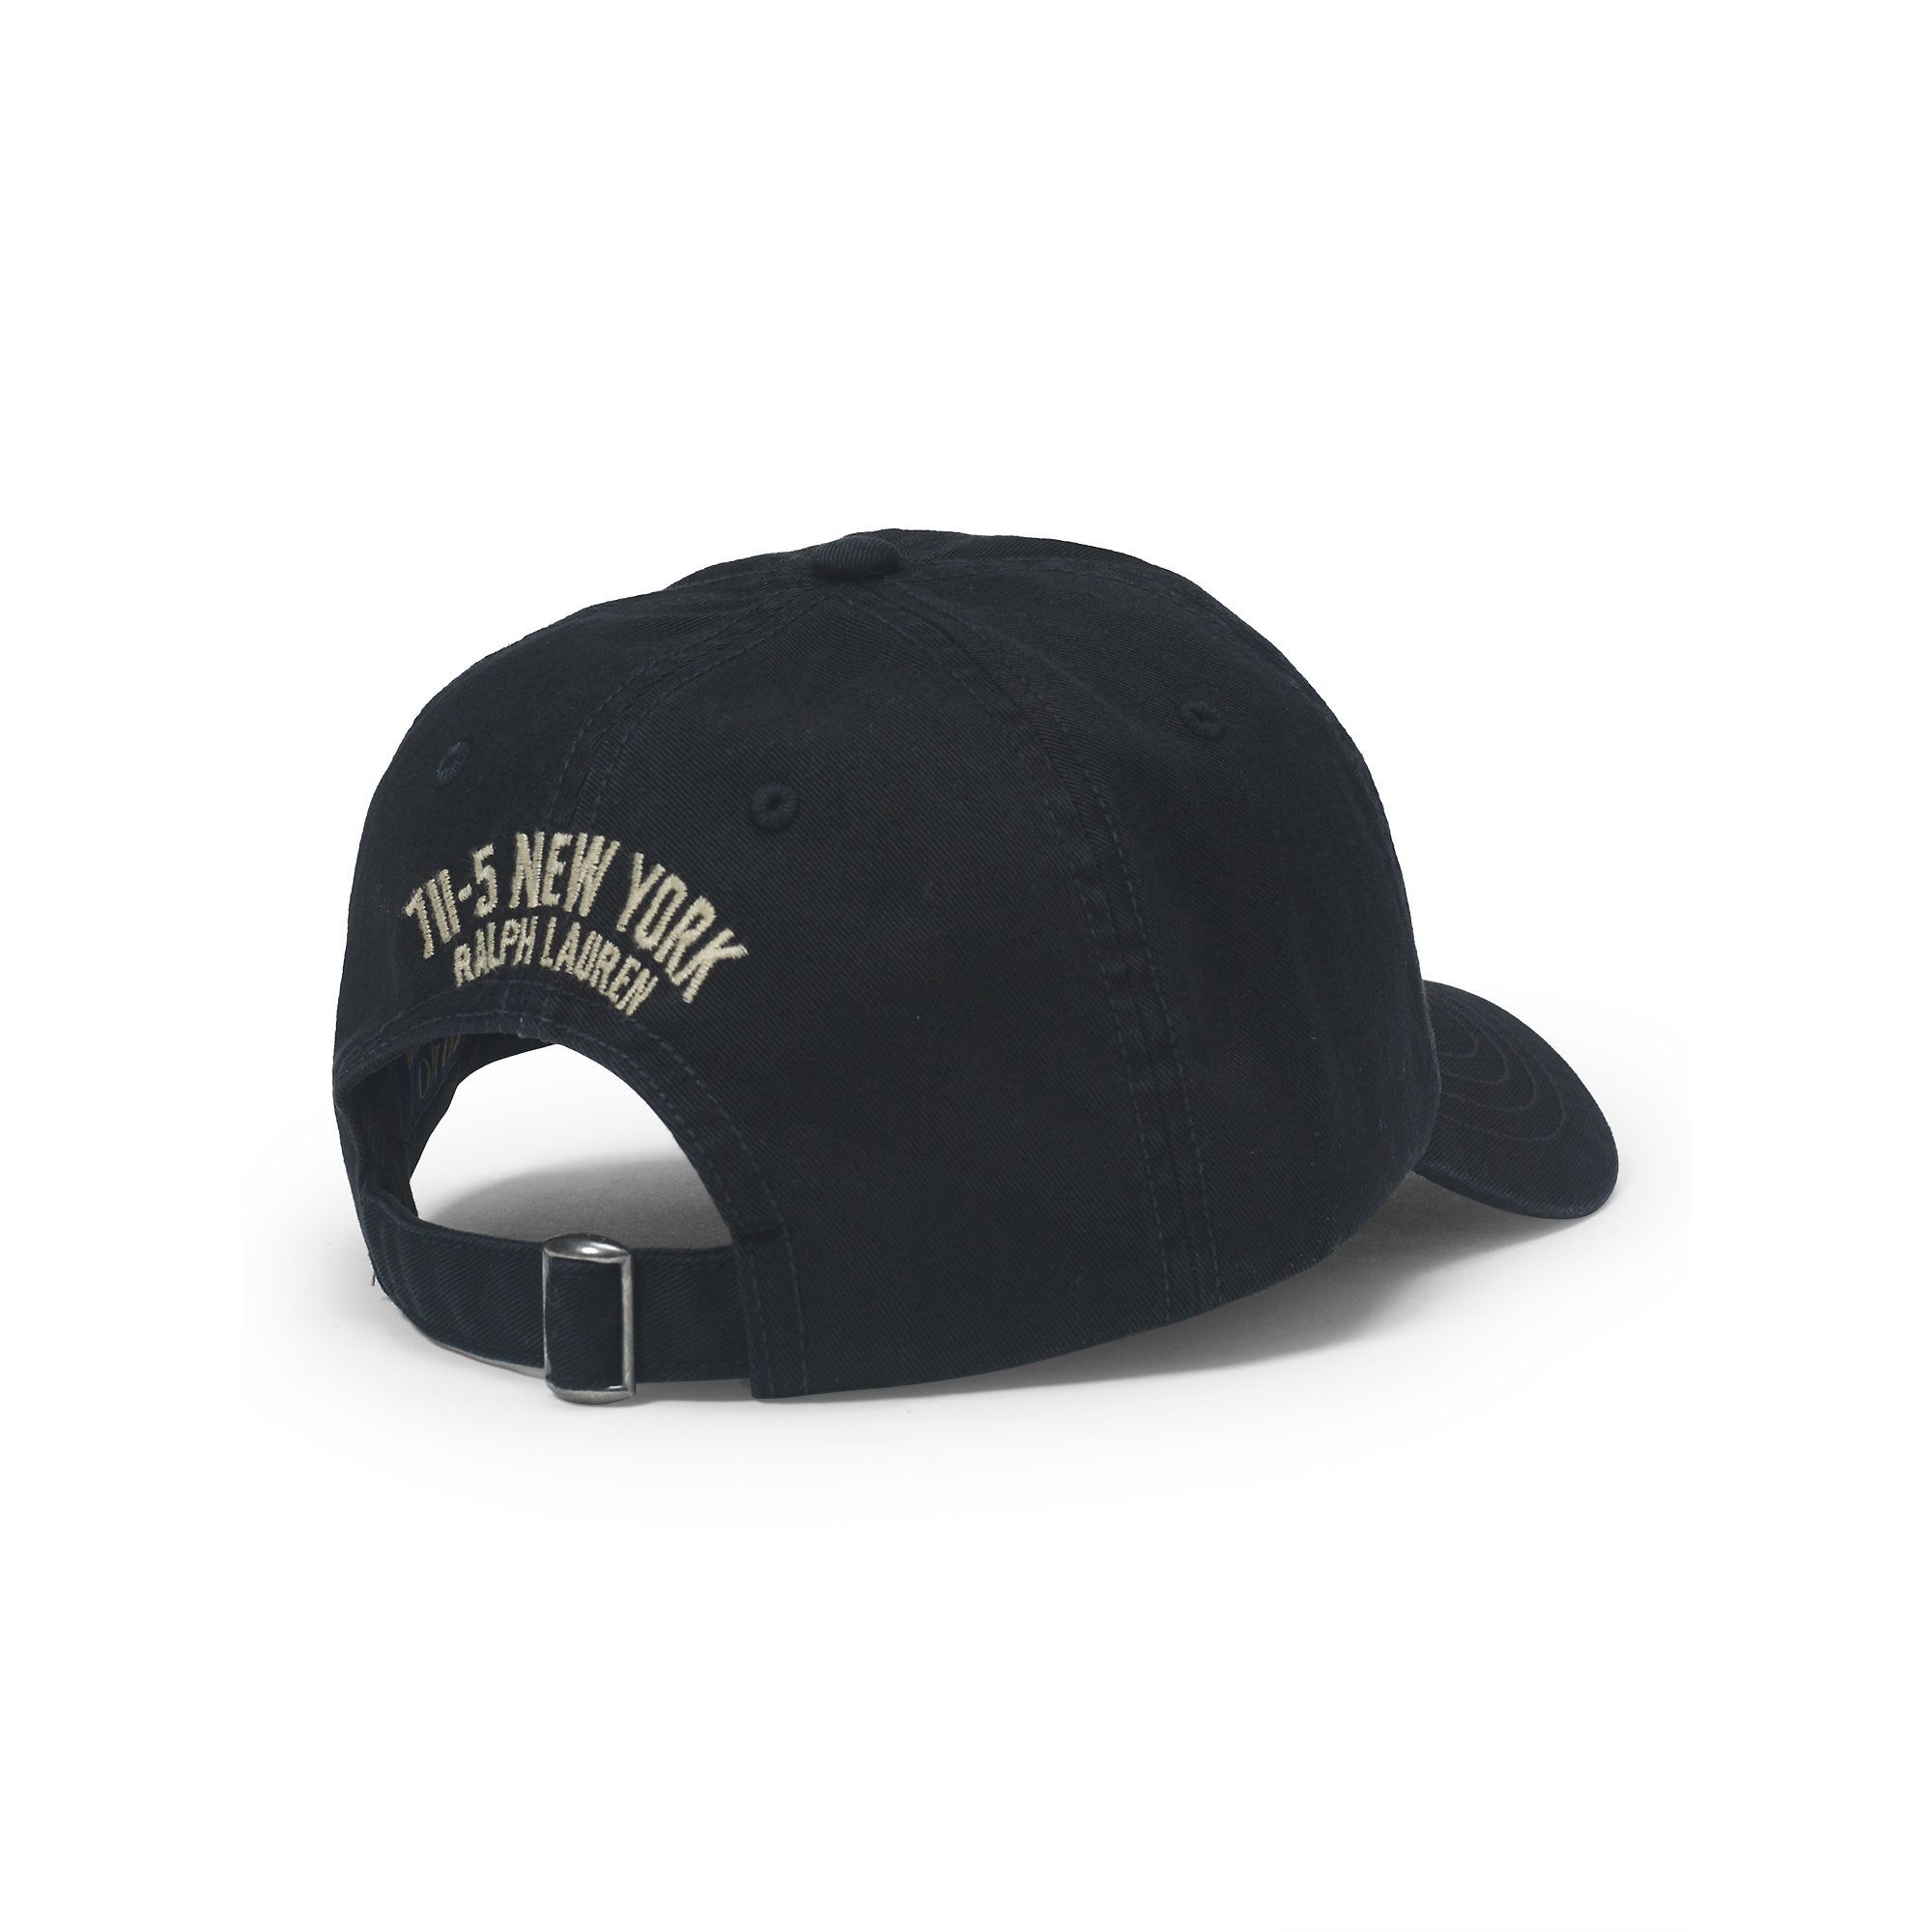 Lyst - Polo Ralph Lauren Varsity P Chino Baseball Cap in Black for Men 397e8ca965a